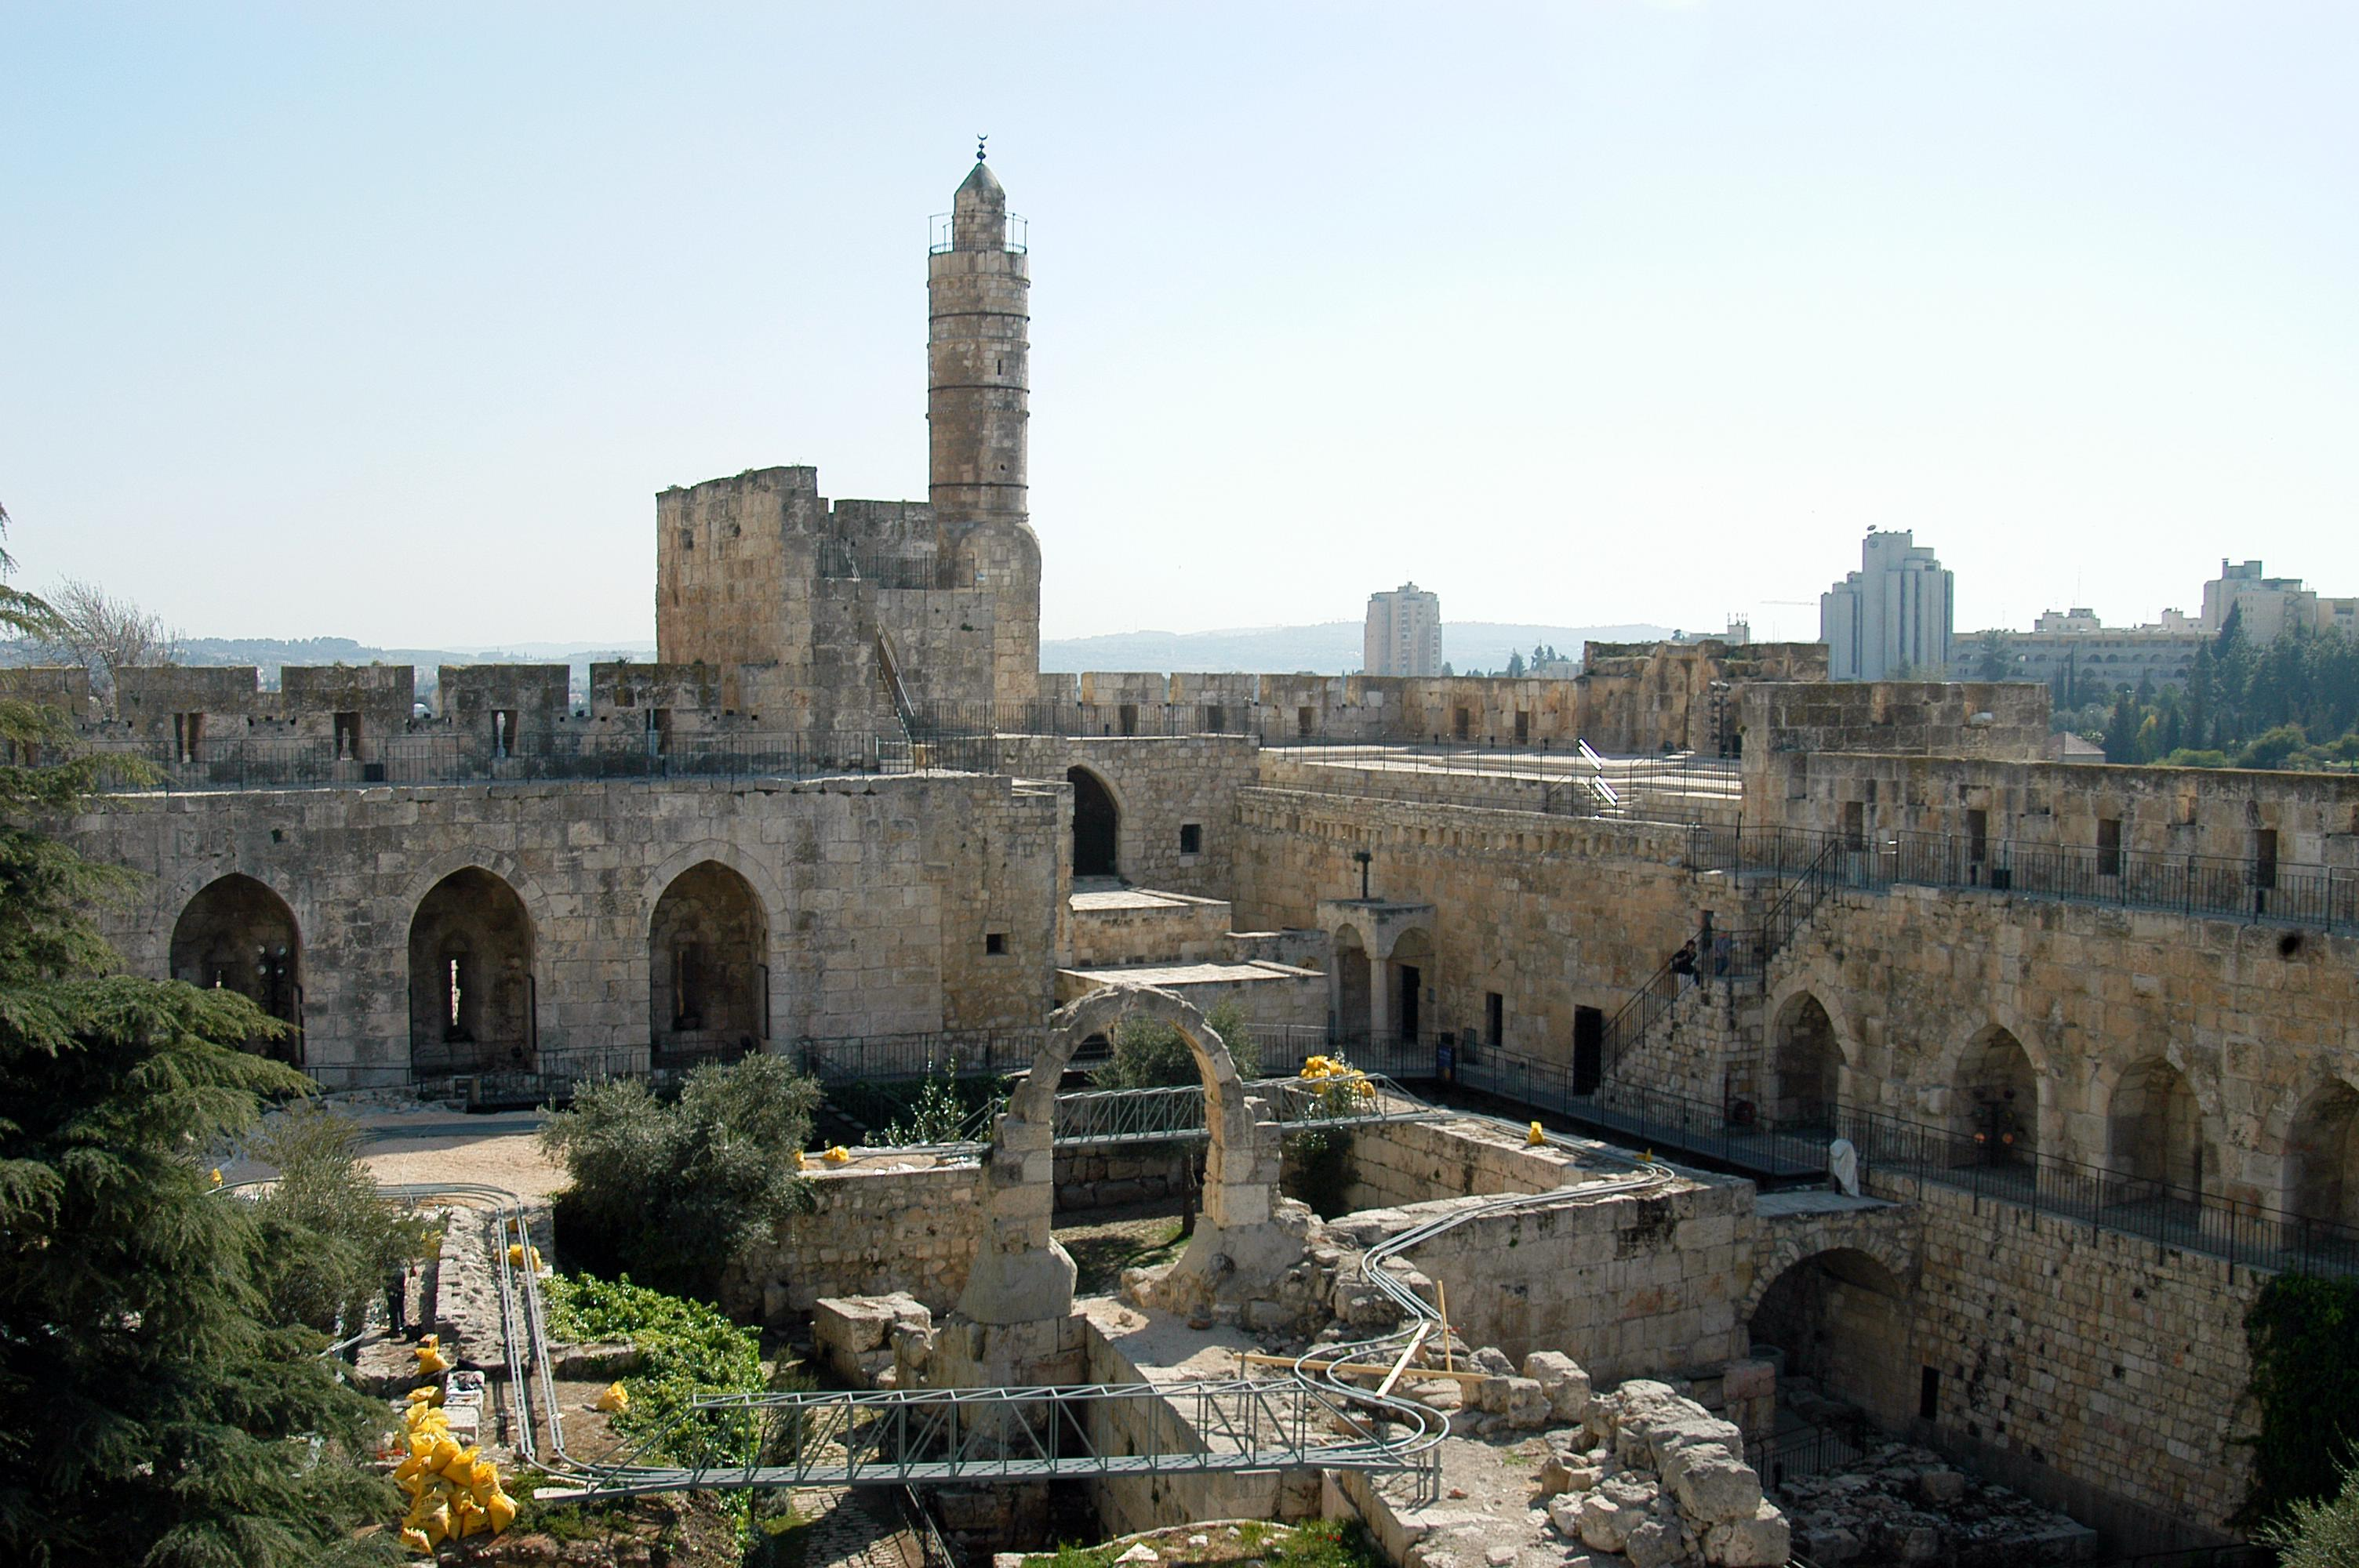 Tower Of David (Citadel), Jerusalem by Wayne McLean (CC)